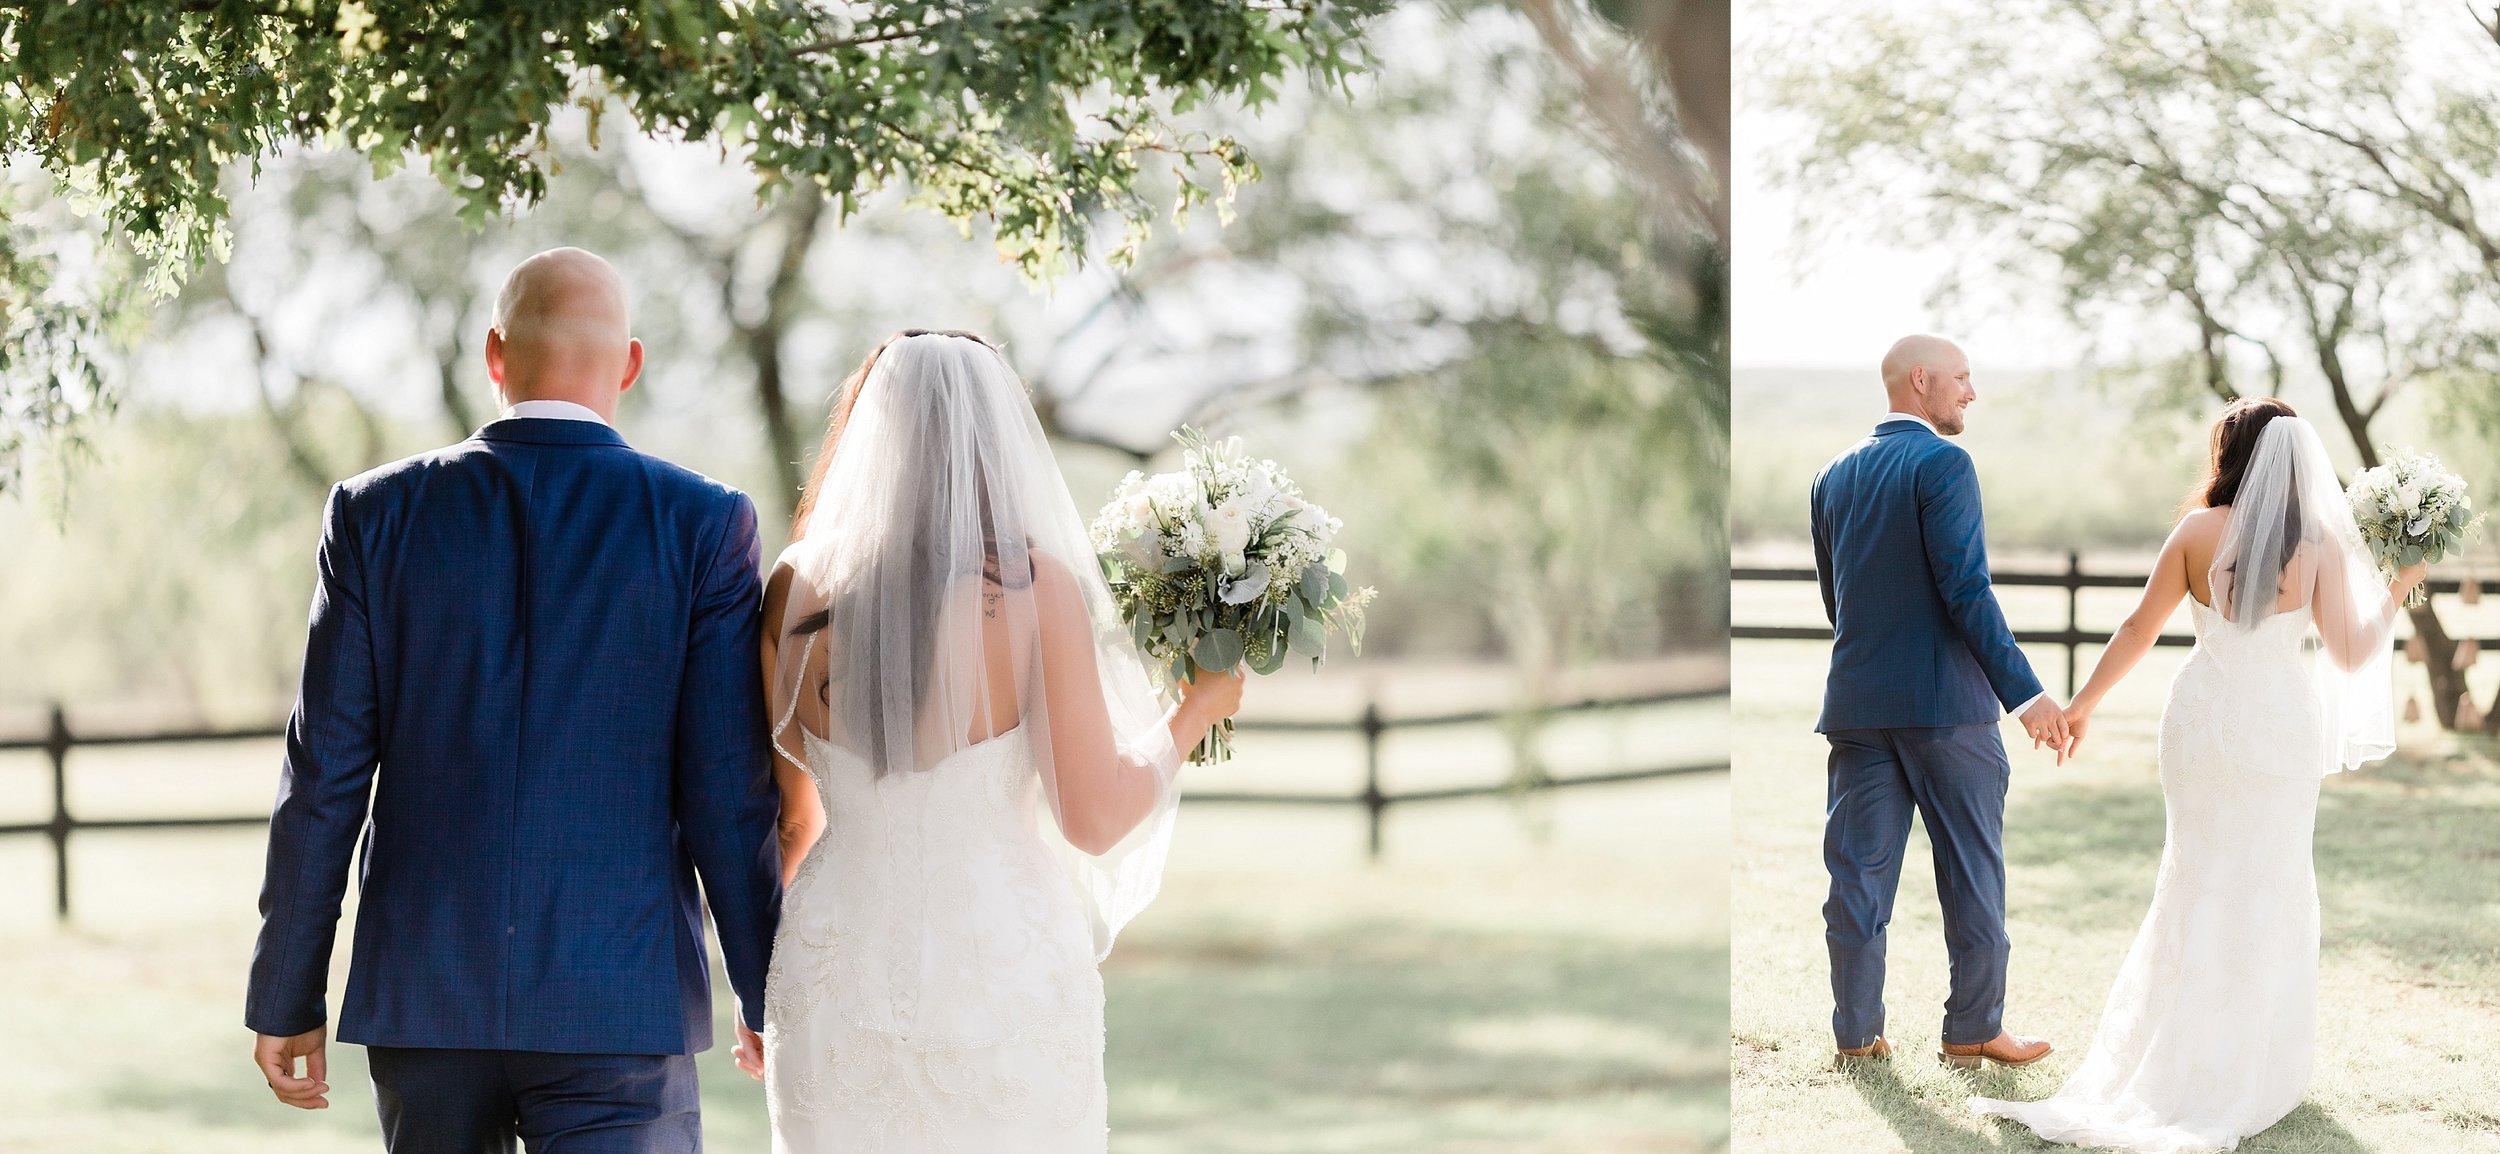 bailey-and-carl-coyote-ranch-resort-wedding-photographer-wichita-falls-texas-destination-wedding-0027.jpg